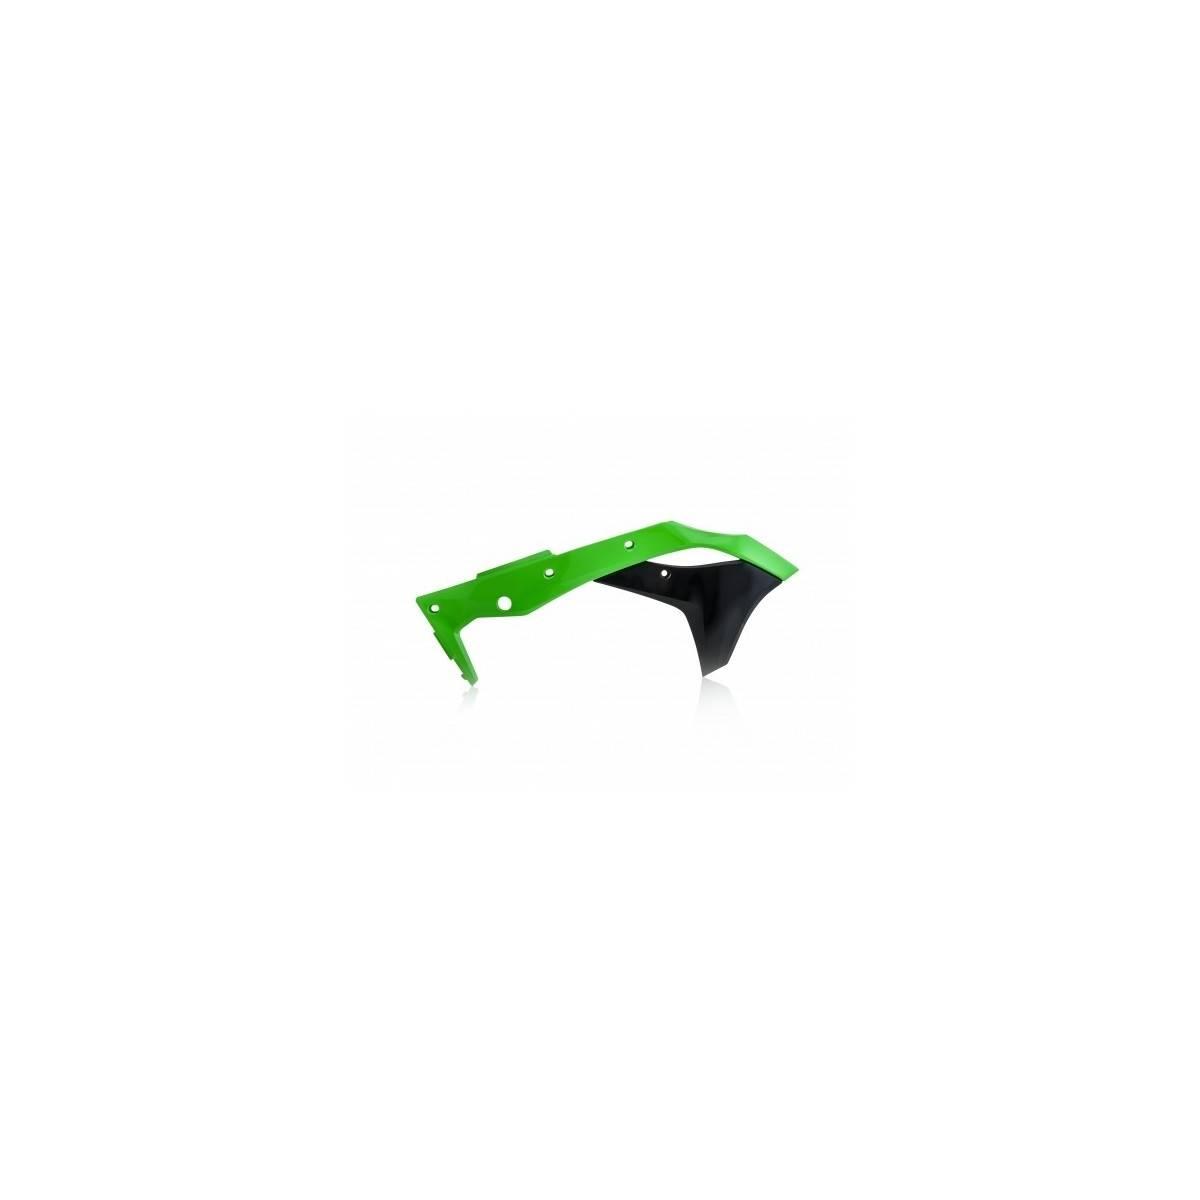 0022376-377 - Tapa Radiador Kx-F 250 17 18 Verde Negro